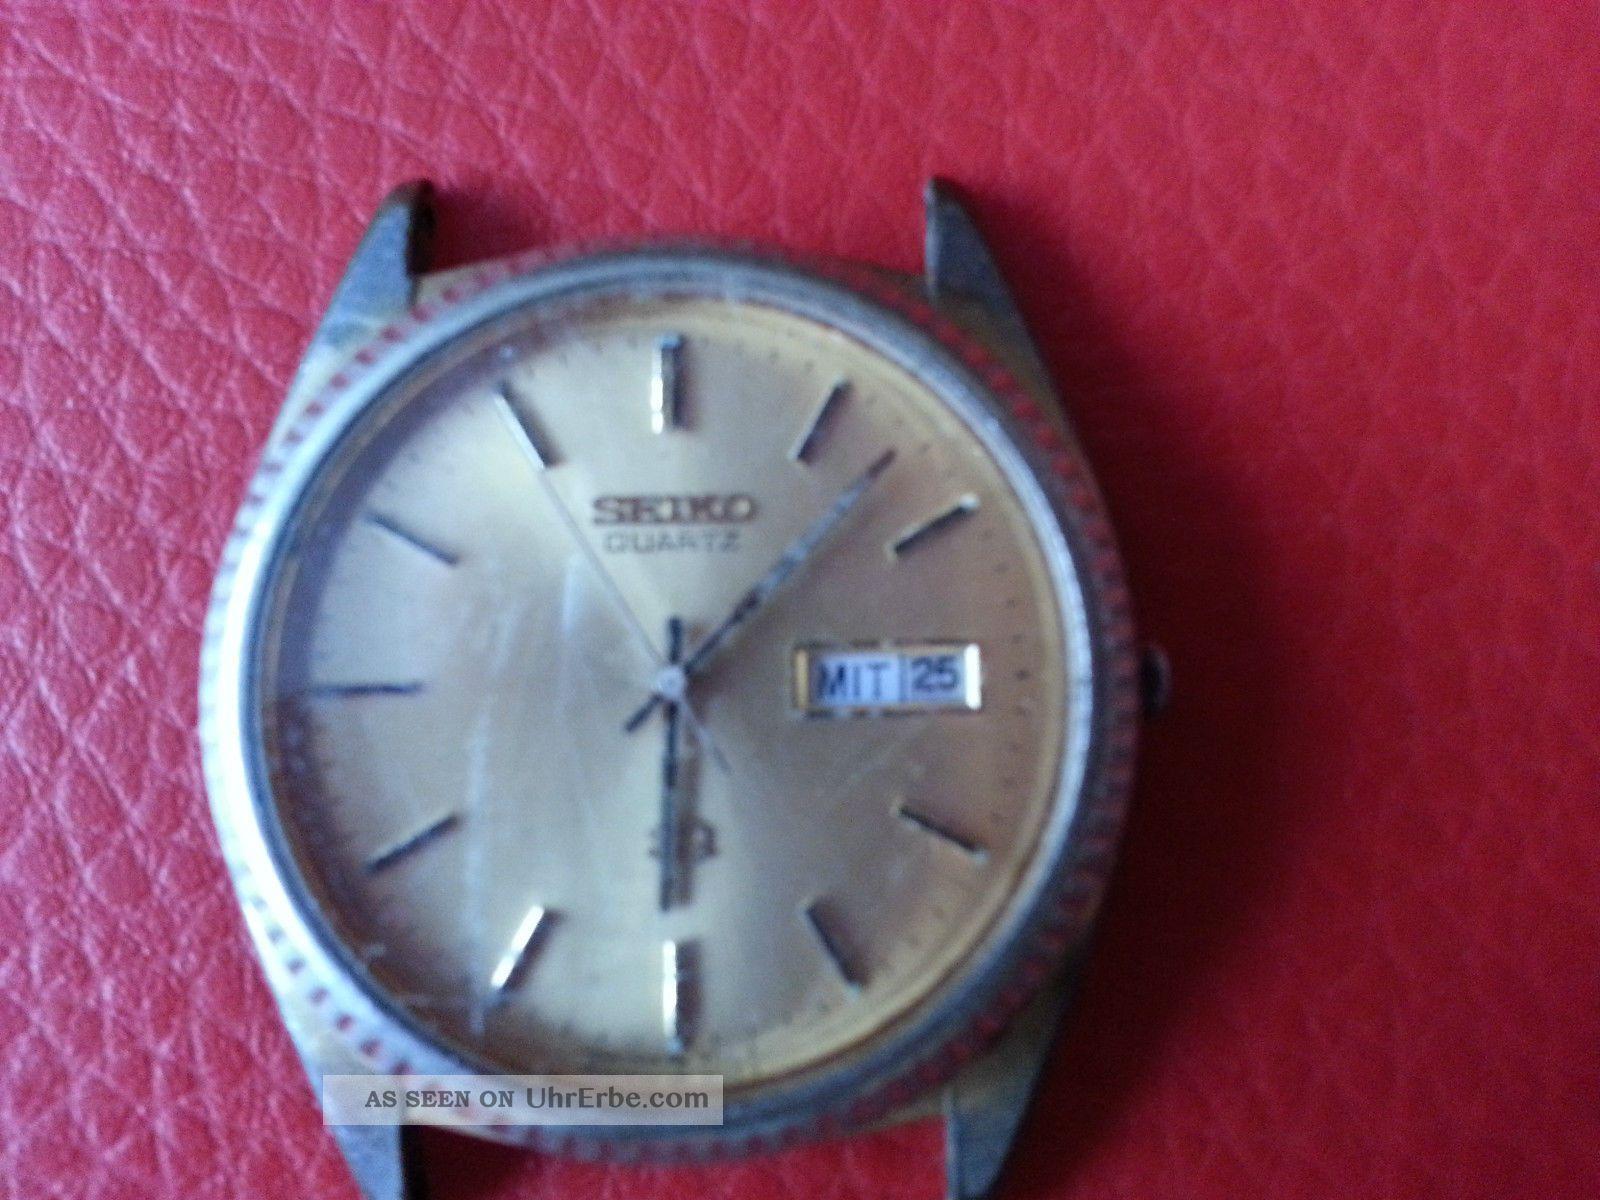 Alte Seiko Armbanduhr Armbanduhren Bild